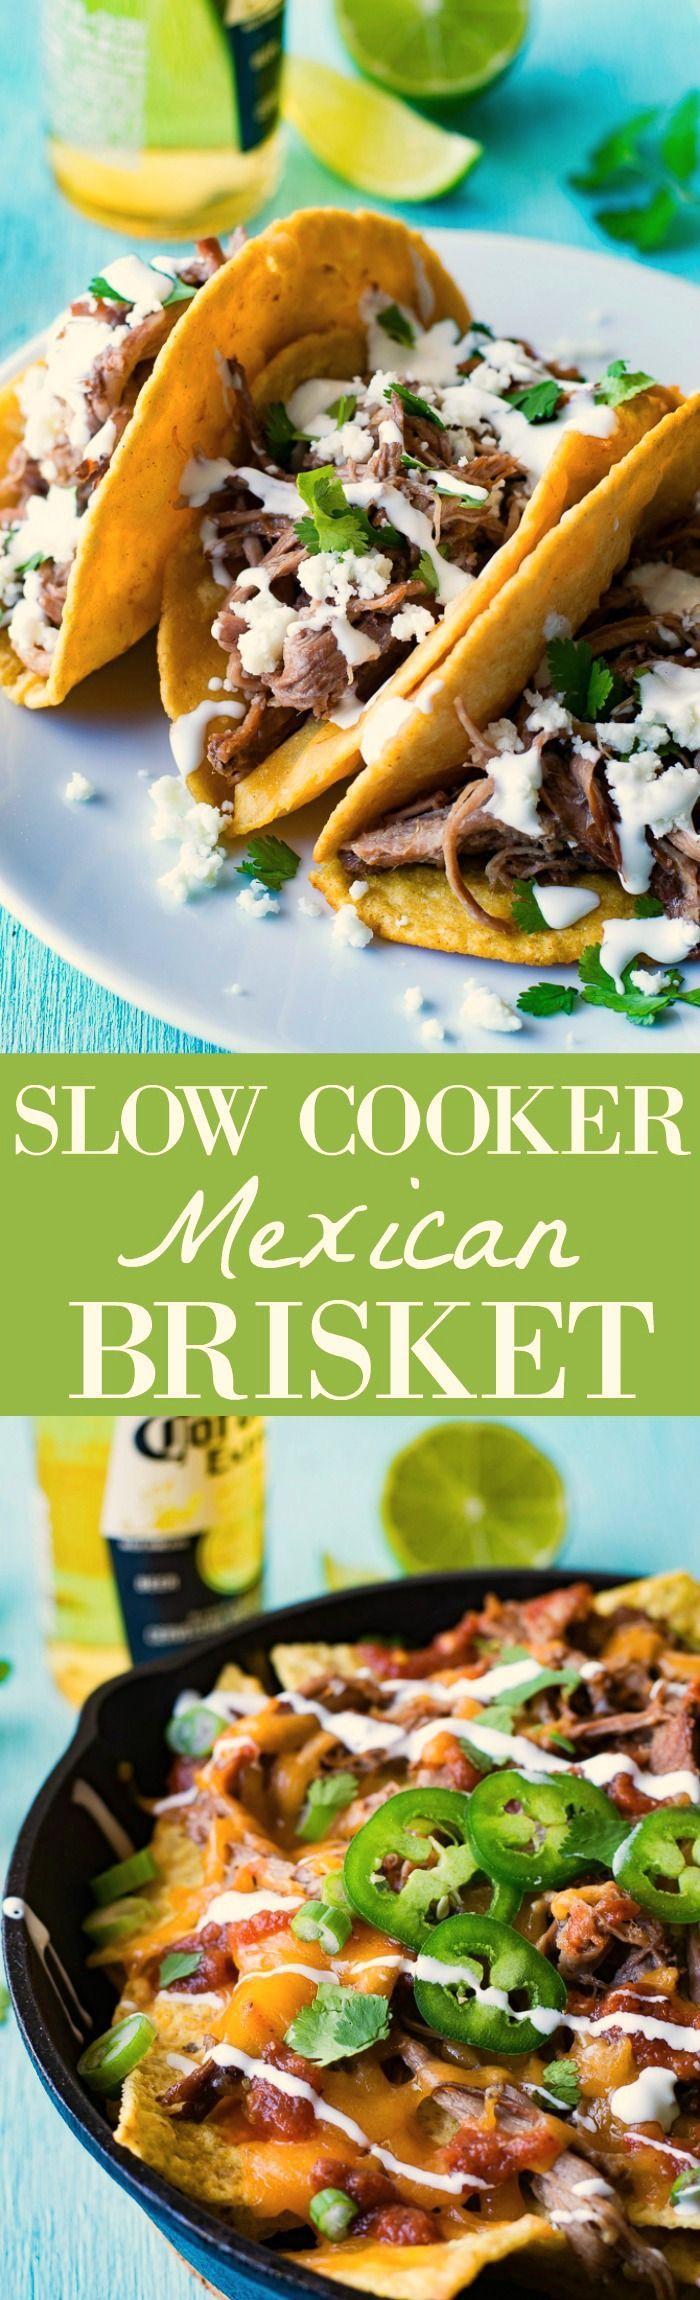 Slow Cooker Mexican Brisket http://houseofyumm.com/slow-cooker-mexican-brisket/